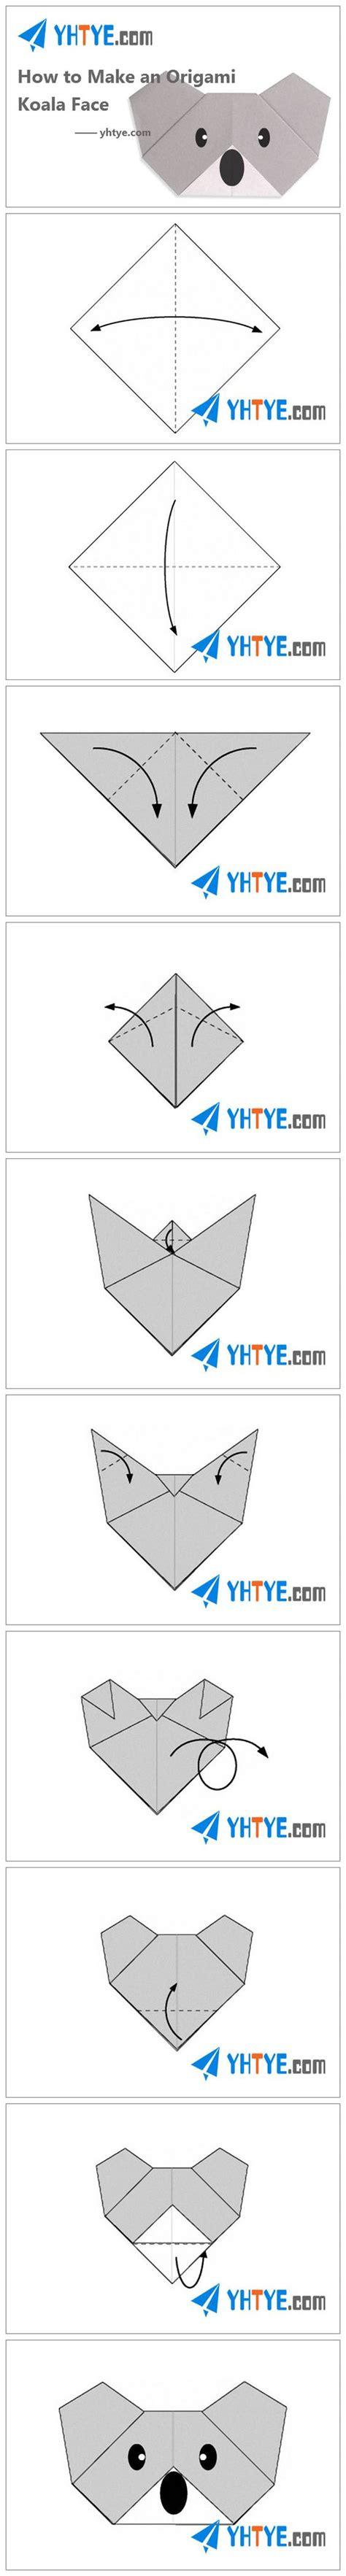 how to make an origami koala how to make an koalas and origami on